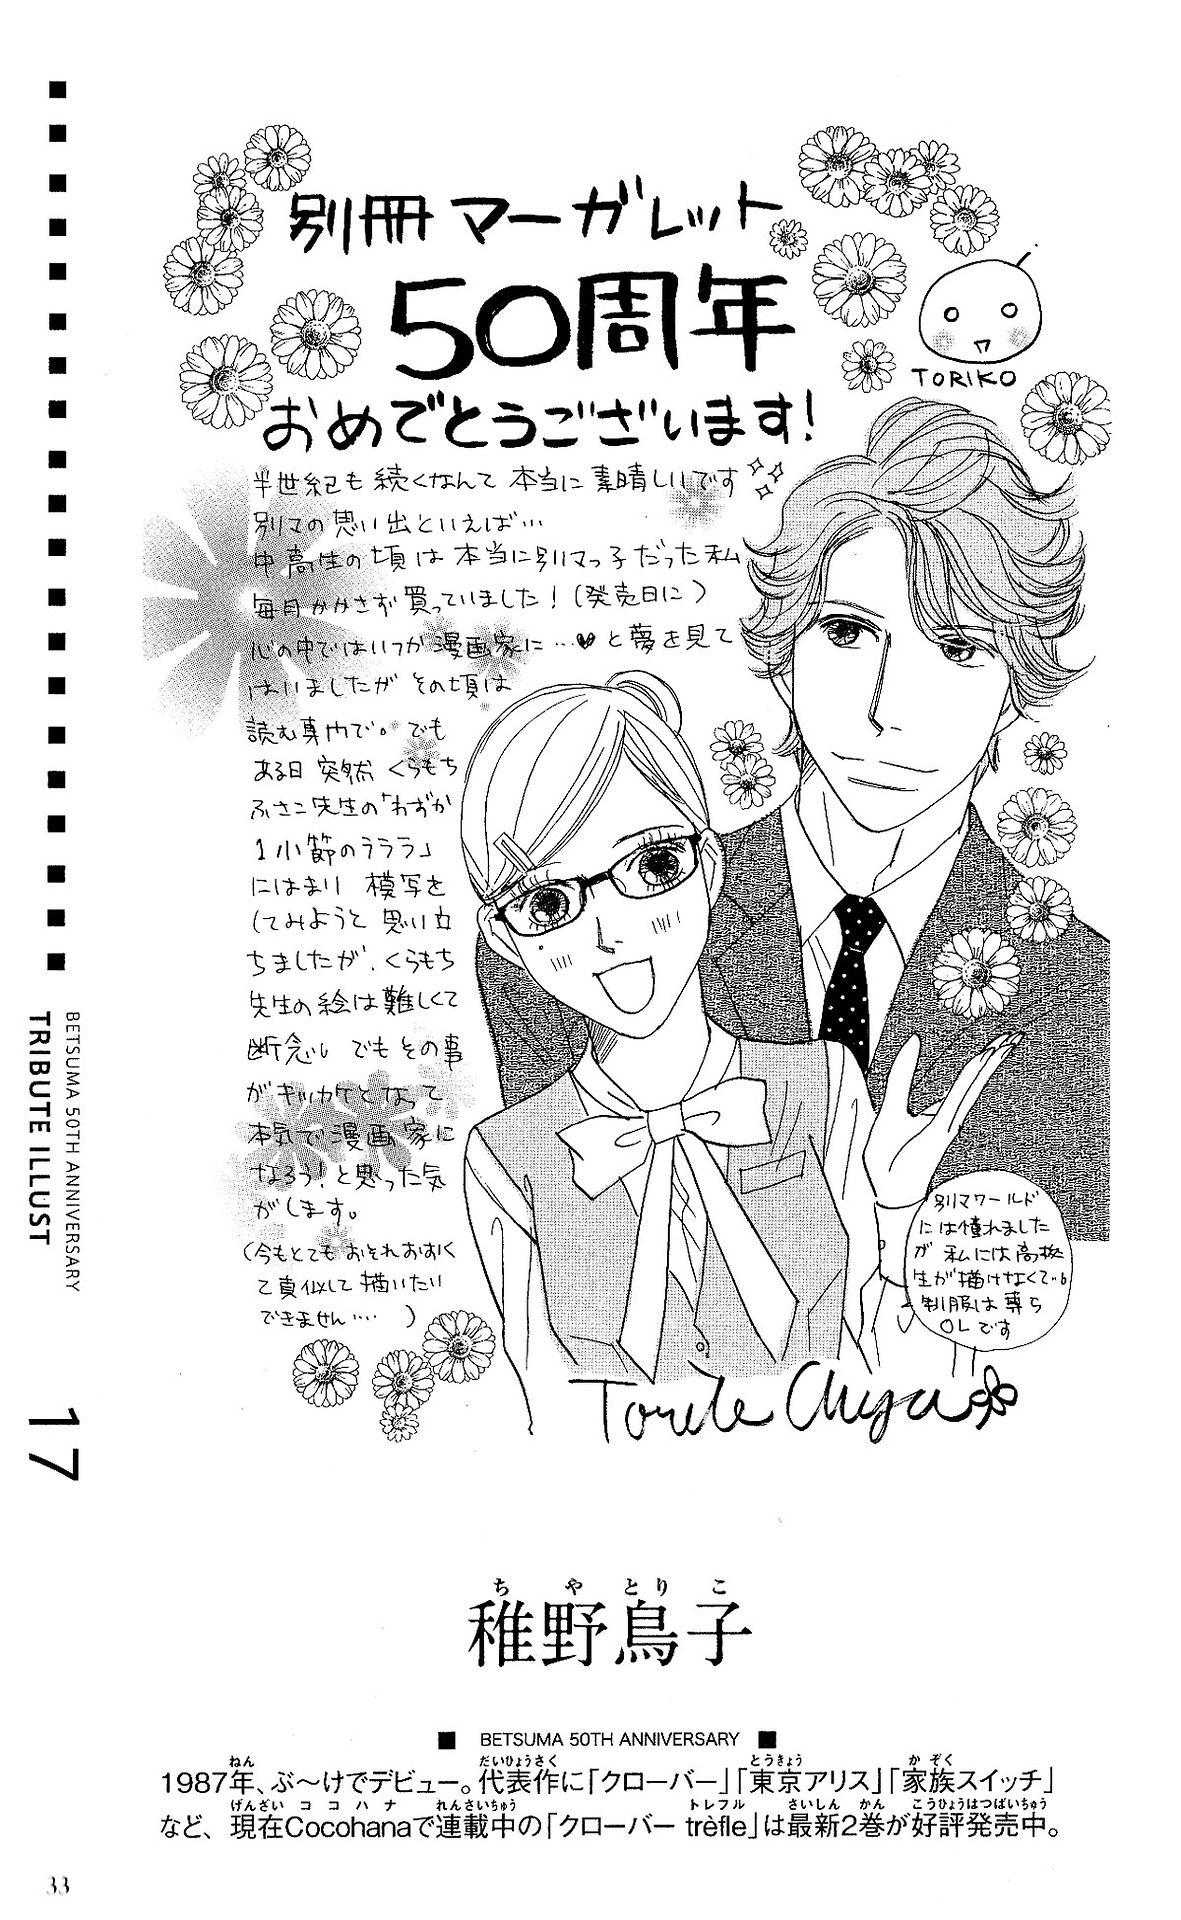 17 - Chiya Toriko sensei, the mangaka of Clover, Tokyo Alice and Clover Trefle (her current work), congratulating Betsuma's 50th Anniversary.